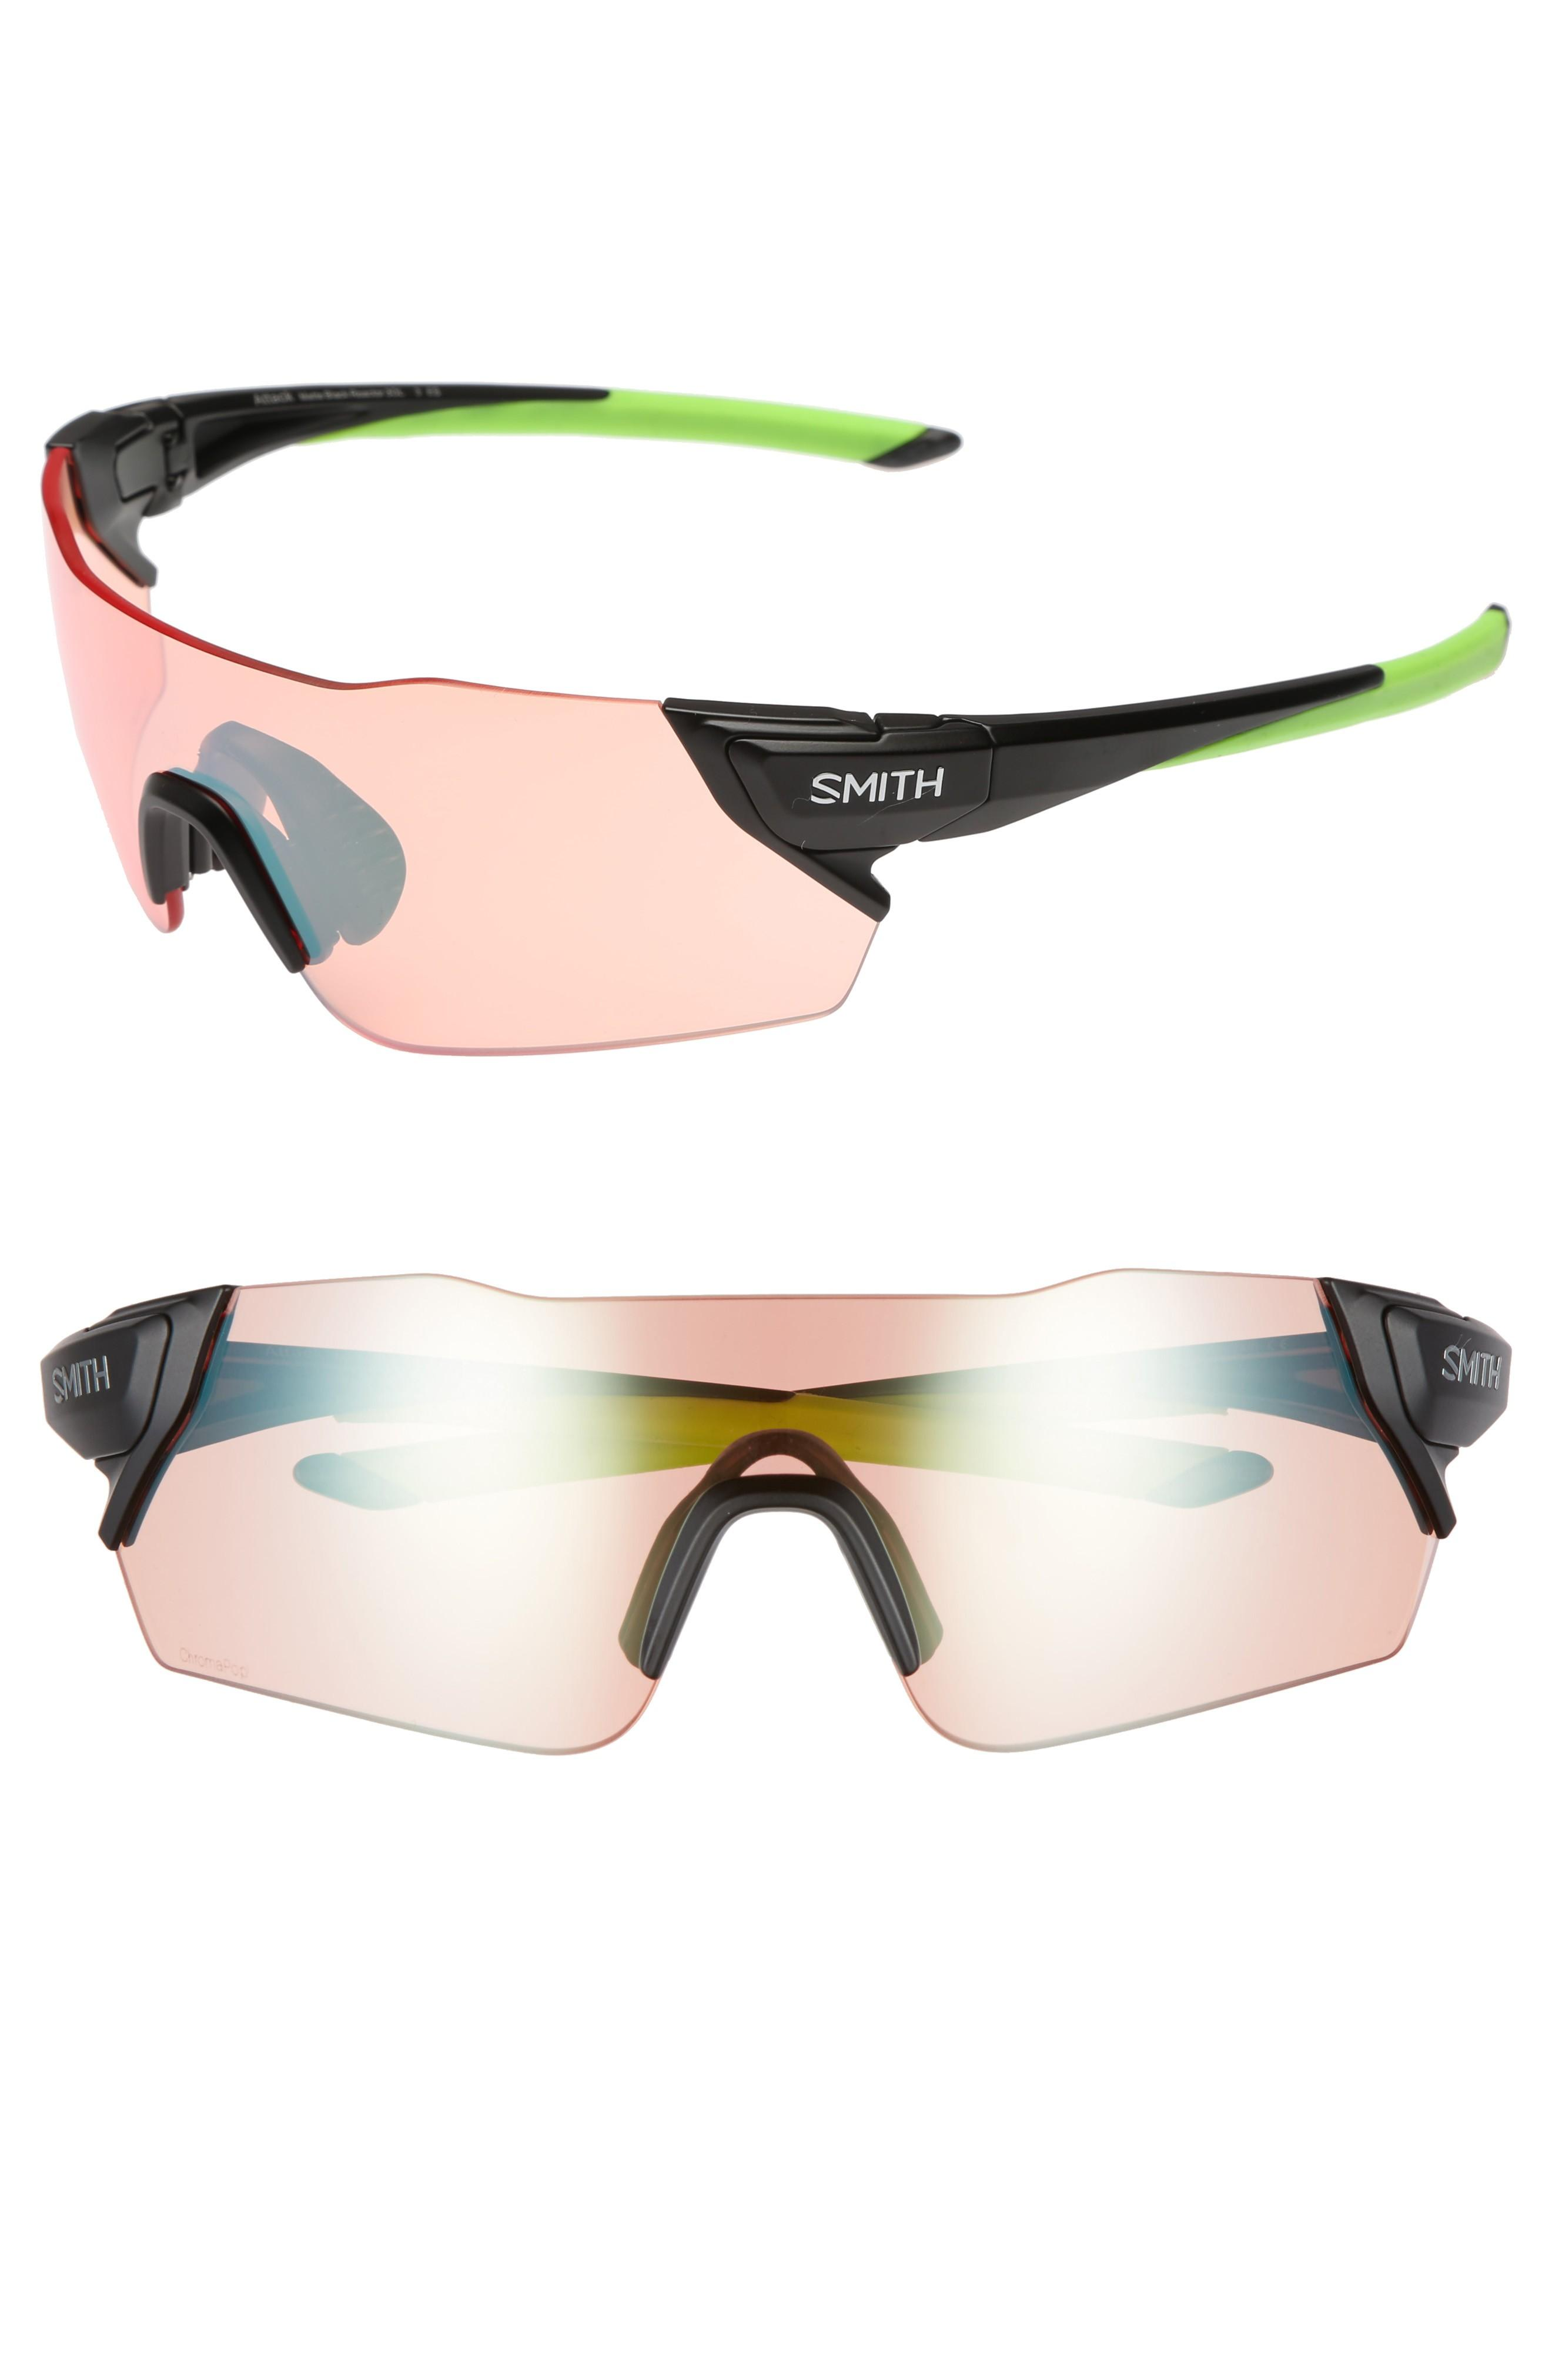 db5ec0214b Smith Attack 125Mm Chromapop(Tm) Polarized Shield Sunglasses - Matte Black  Reactor  Green